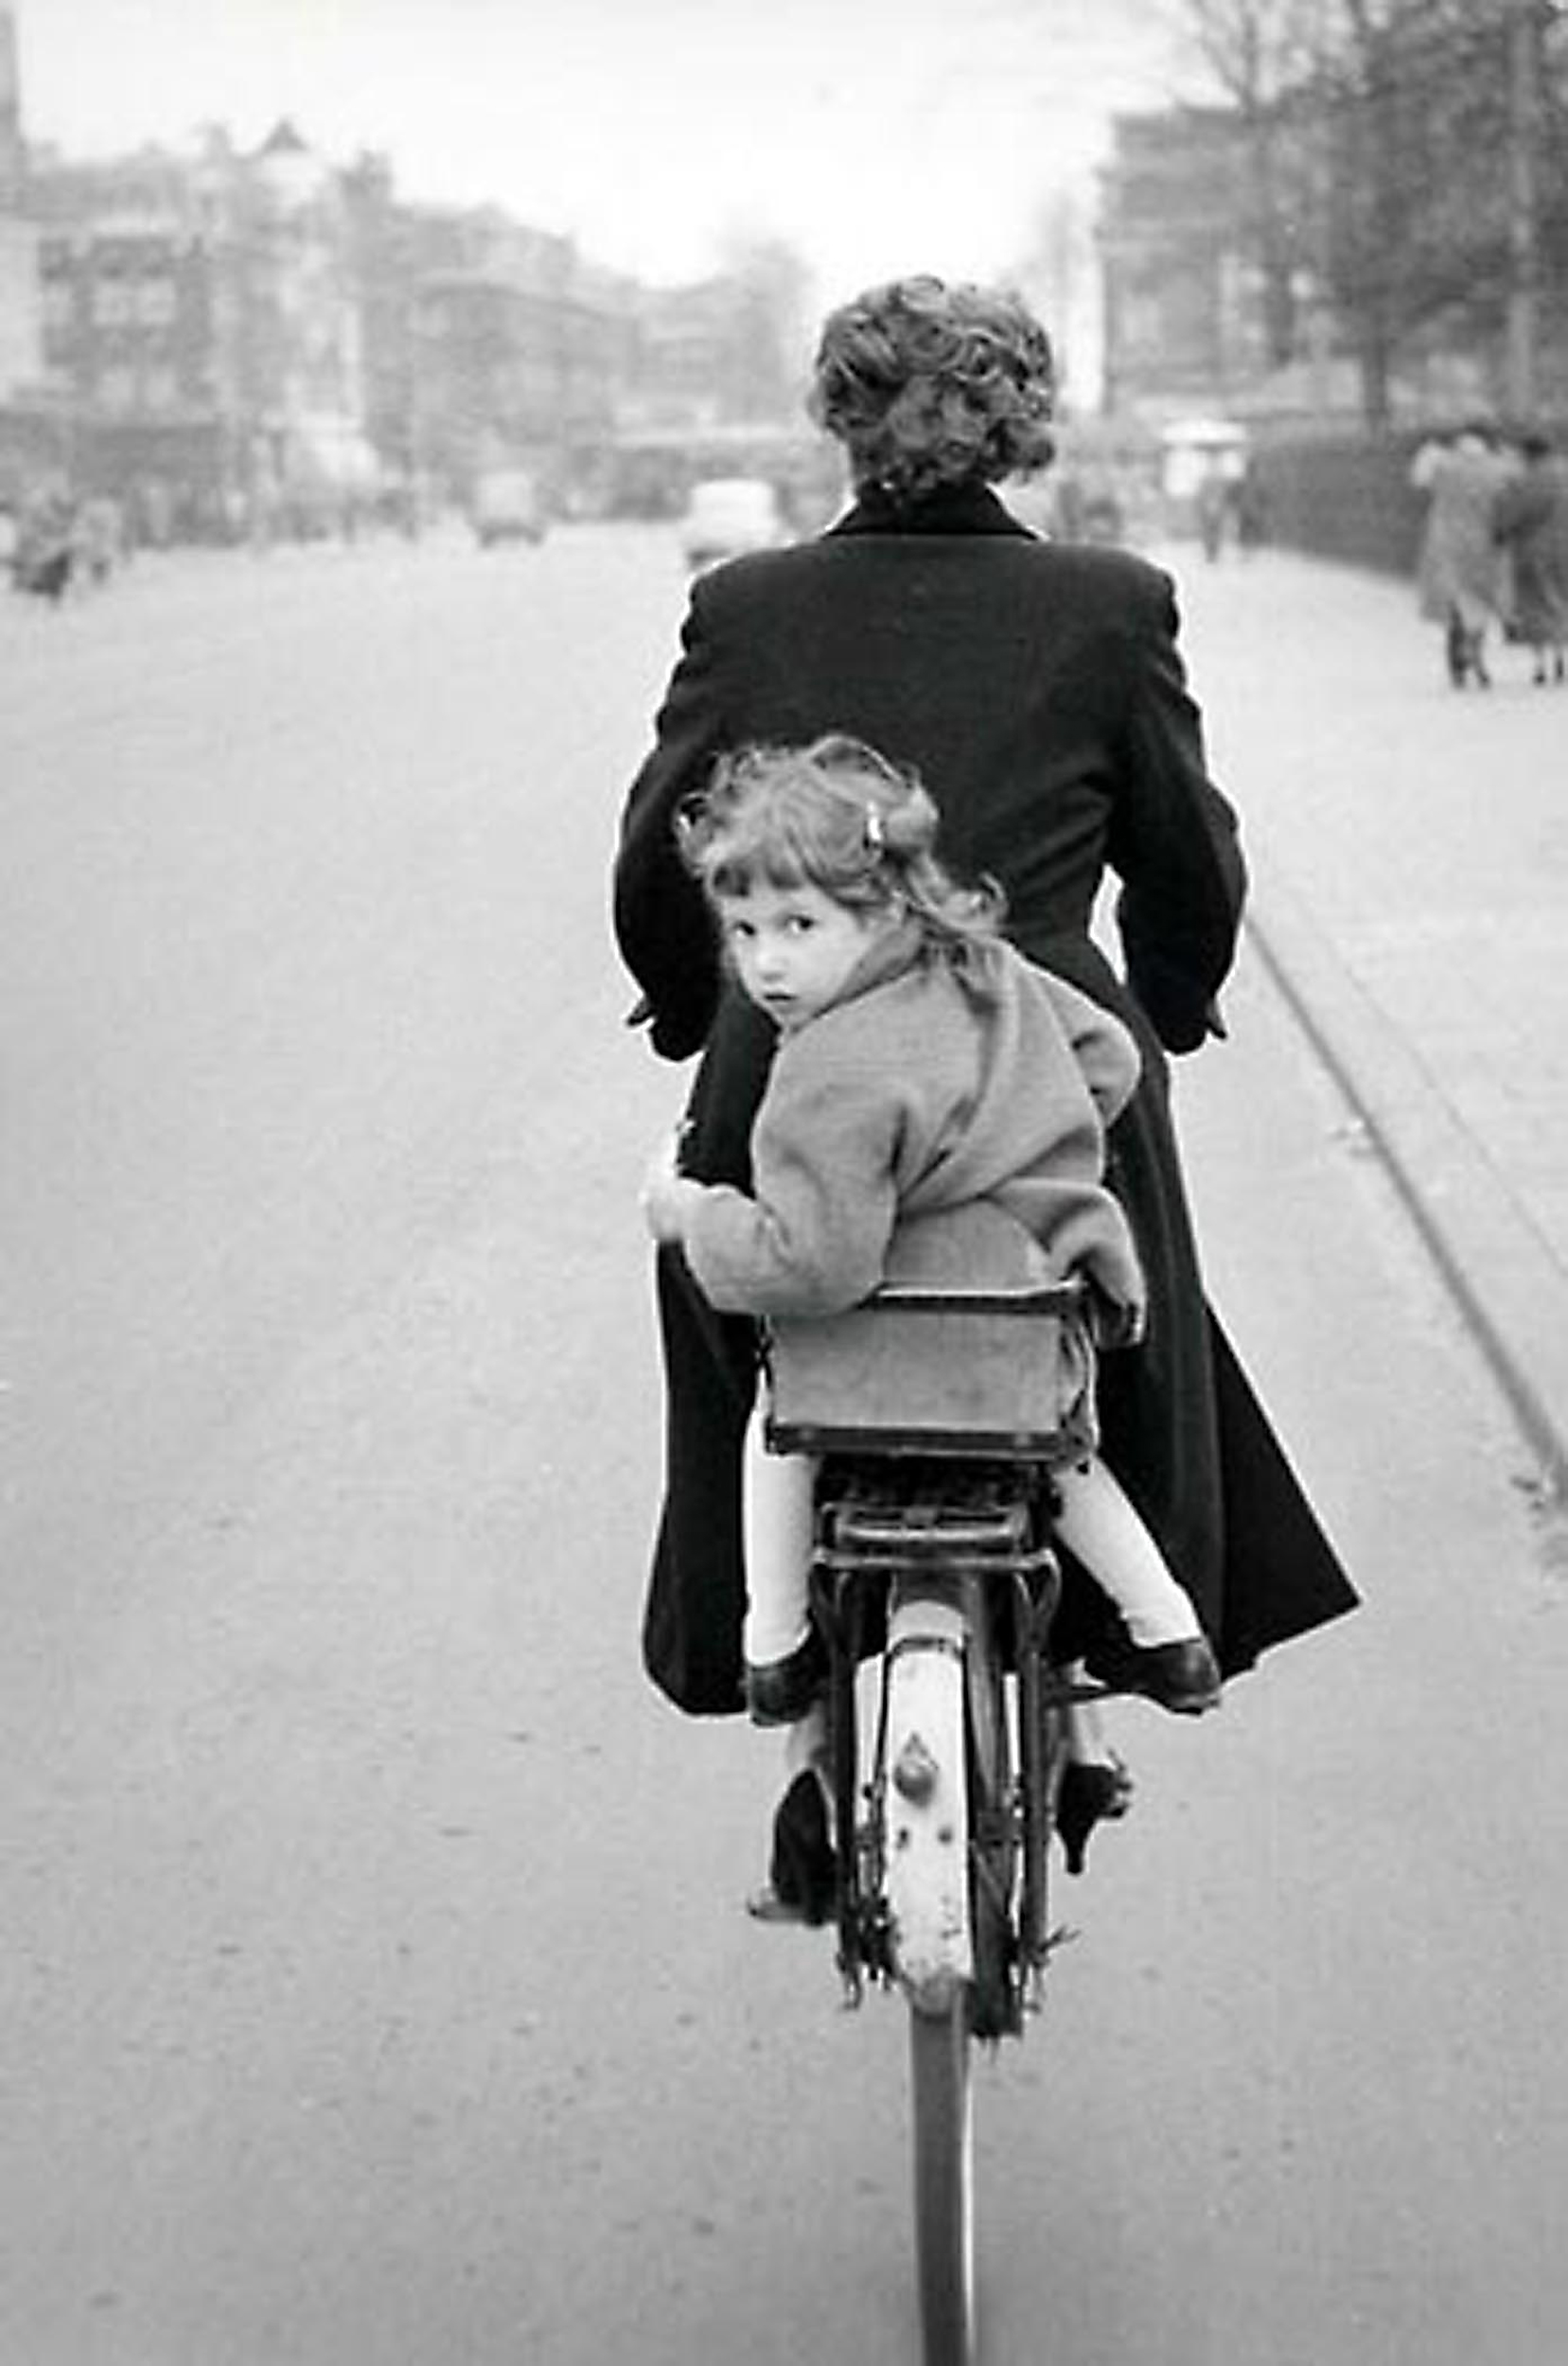 HANNON_girl_on_rear_of_bicycle_(copenhagen)_1956_p11x14_high.jpg